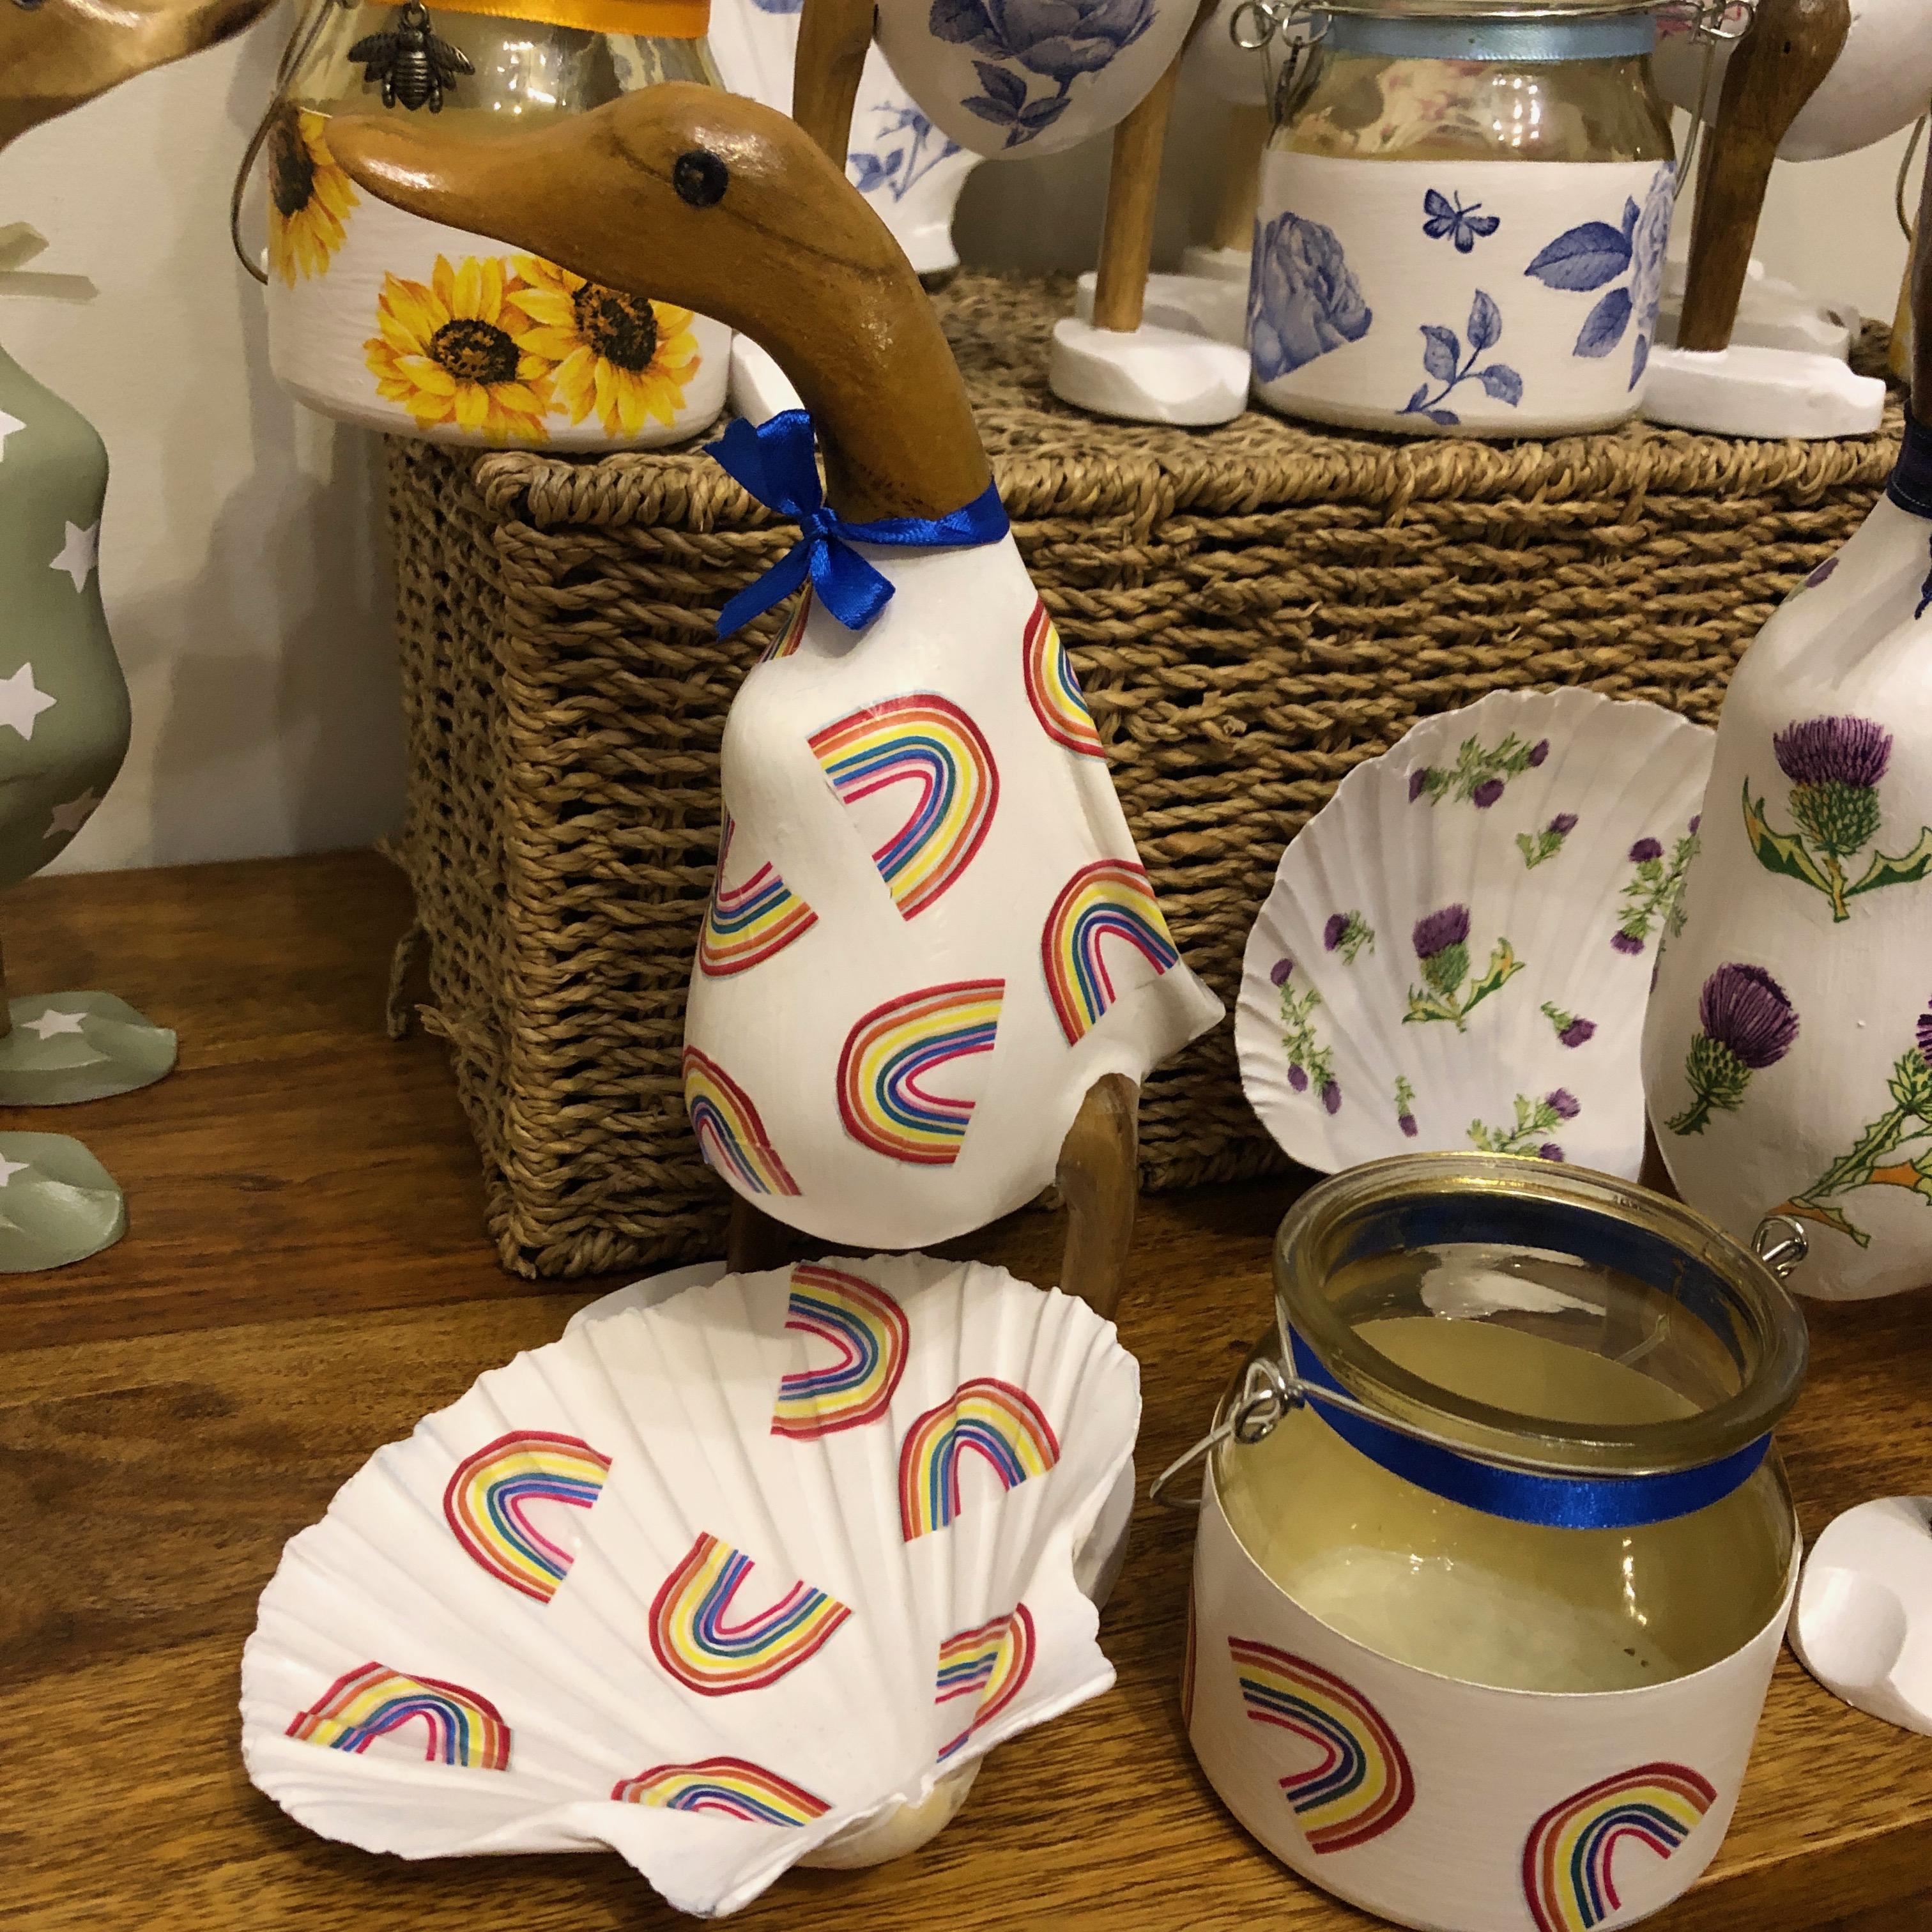 Decoupage Crafts - Ducks, Trinket Dishes & Tea Light Holders